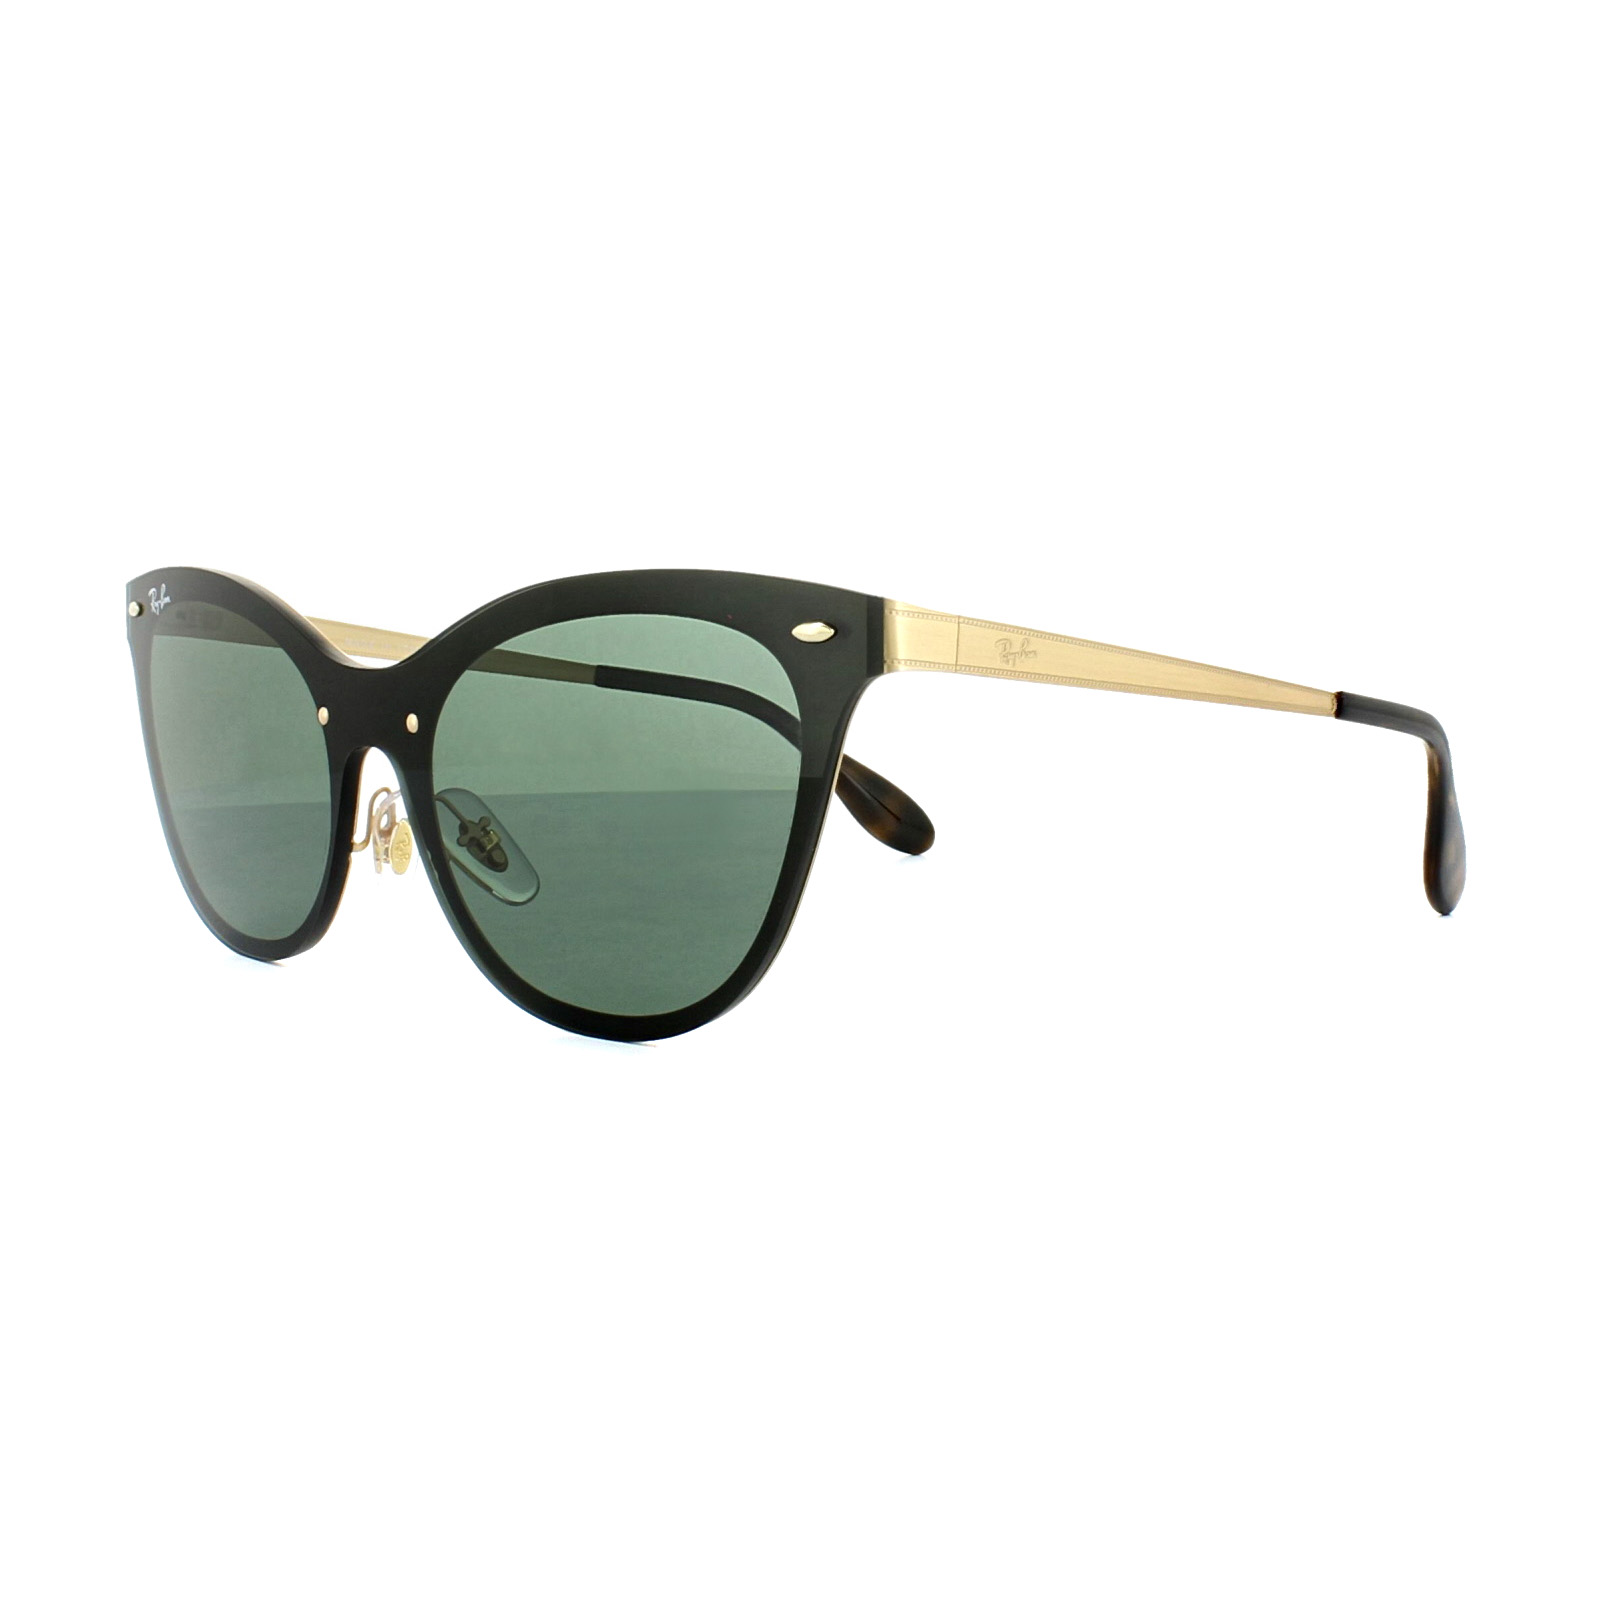 5fb15aa49da5c Sentinel Ray-Ban Sunglasses Blaze Cat Eye 3580N 043 71 Gold Green